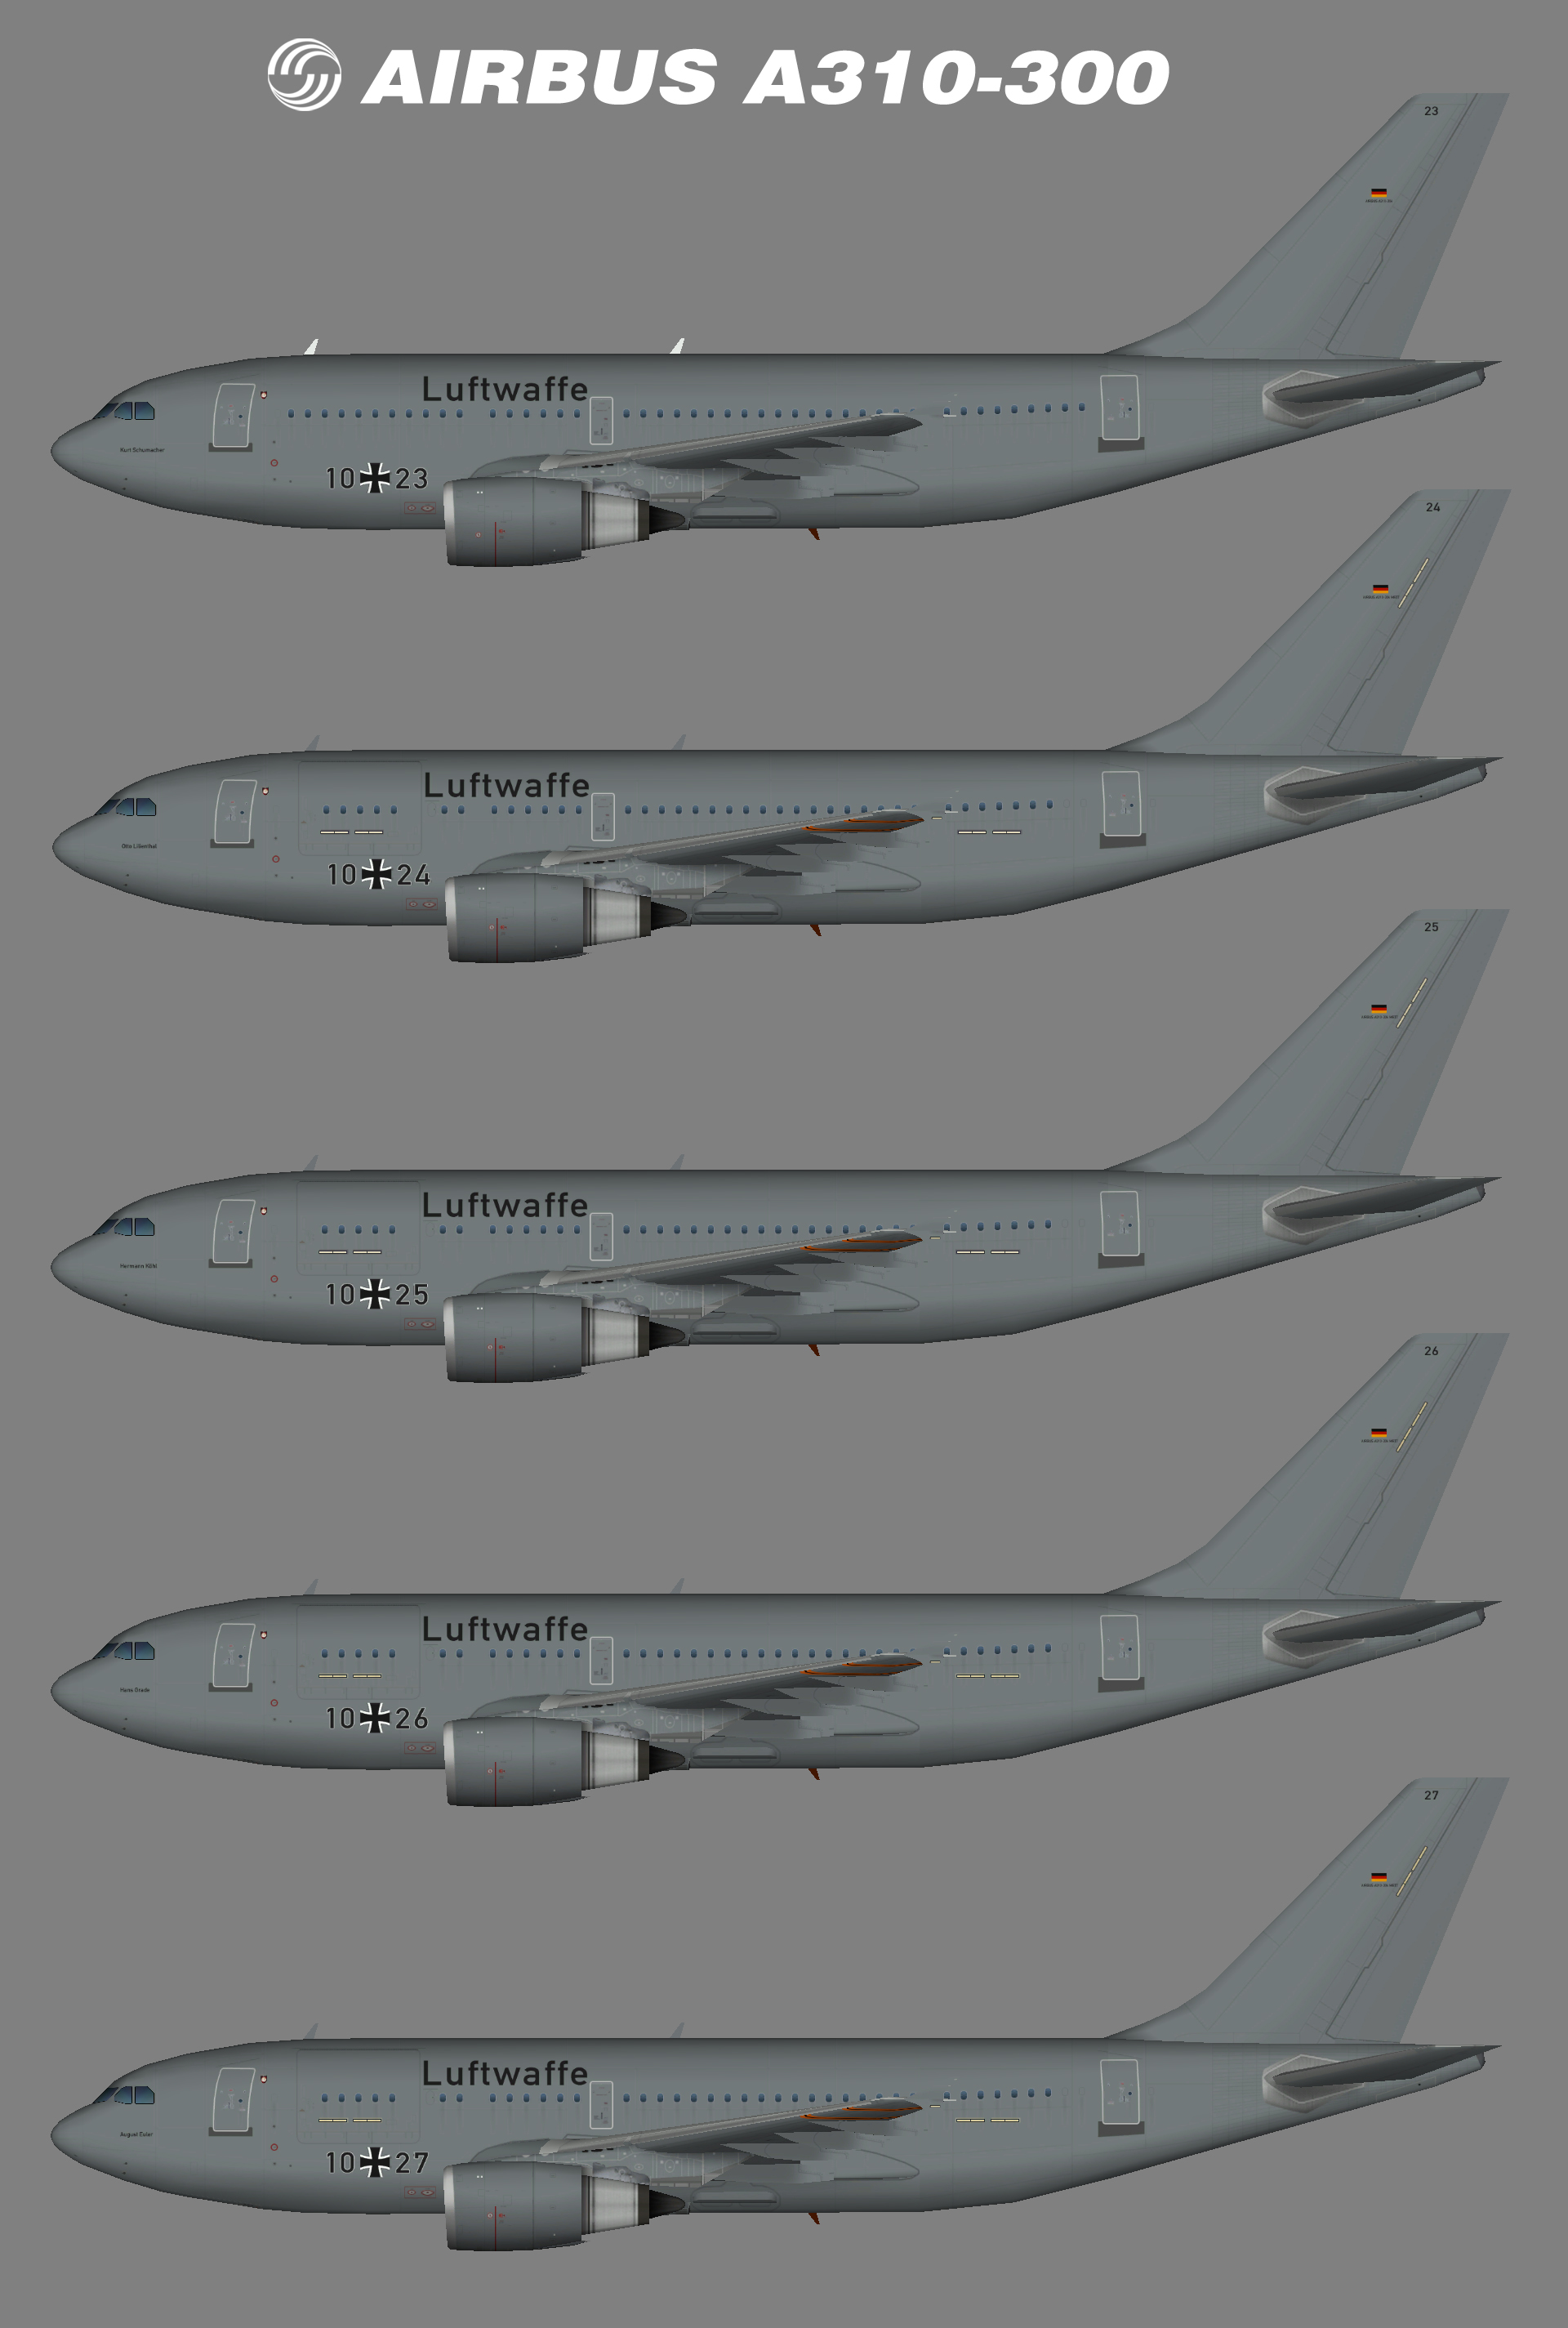 Luftwaffe (German Air Force) Airbus A310-300